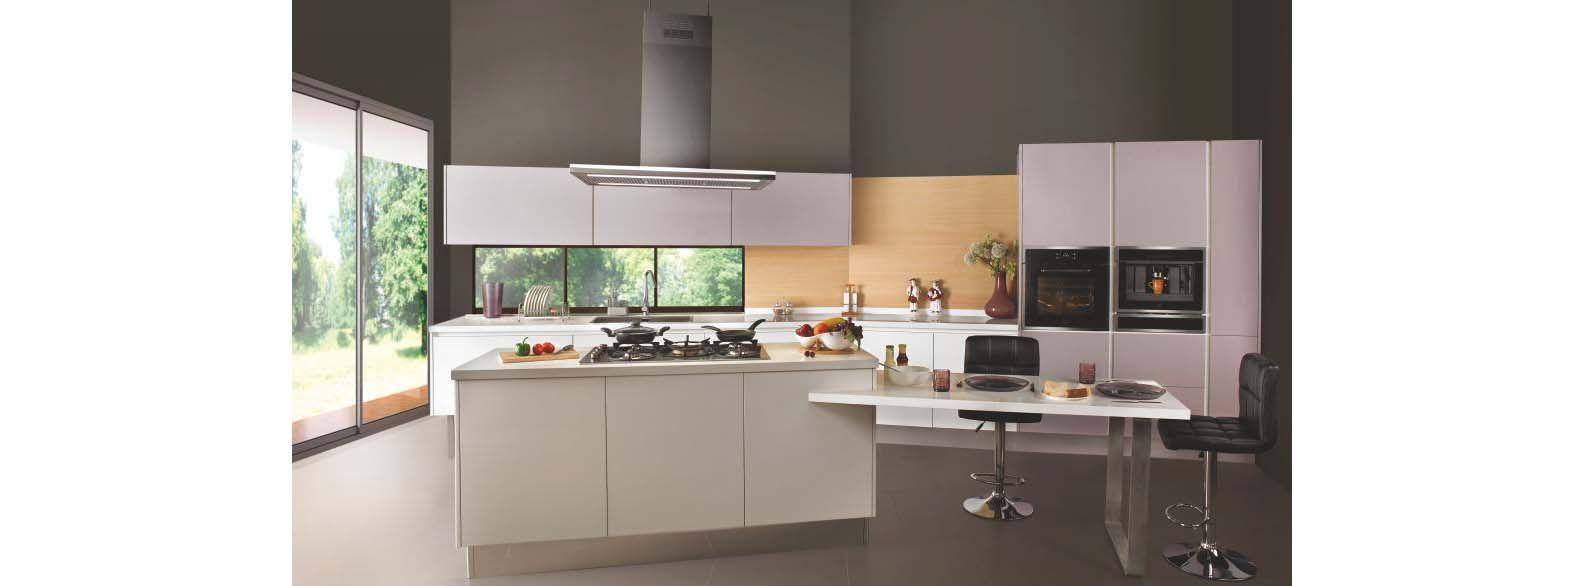 Variety modular kitchen sadikabad nagpur